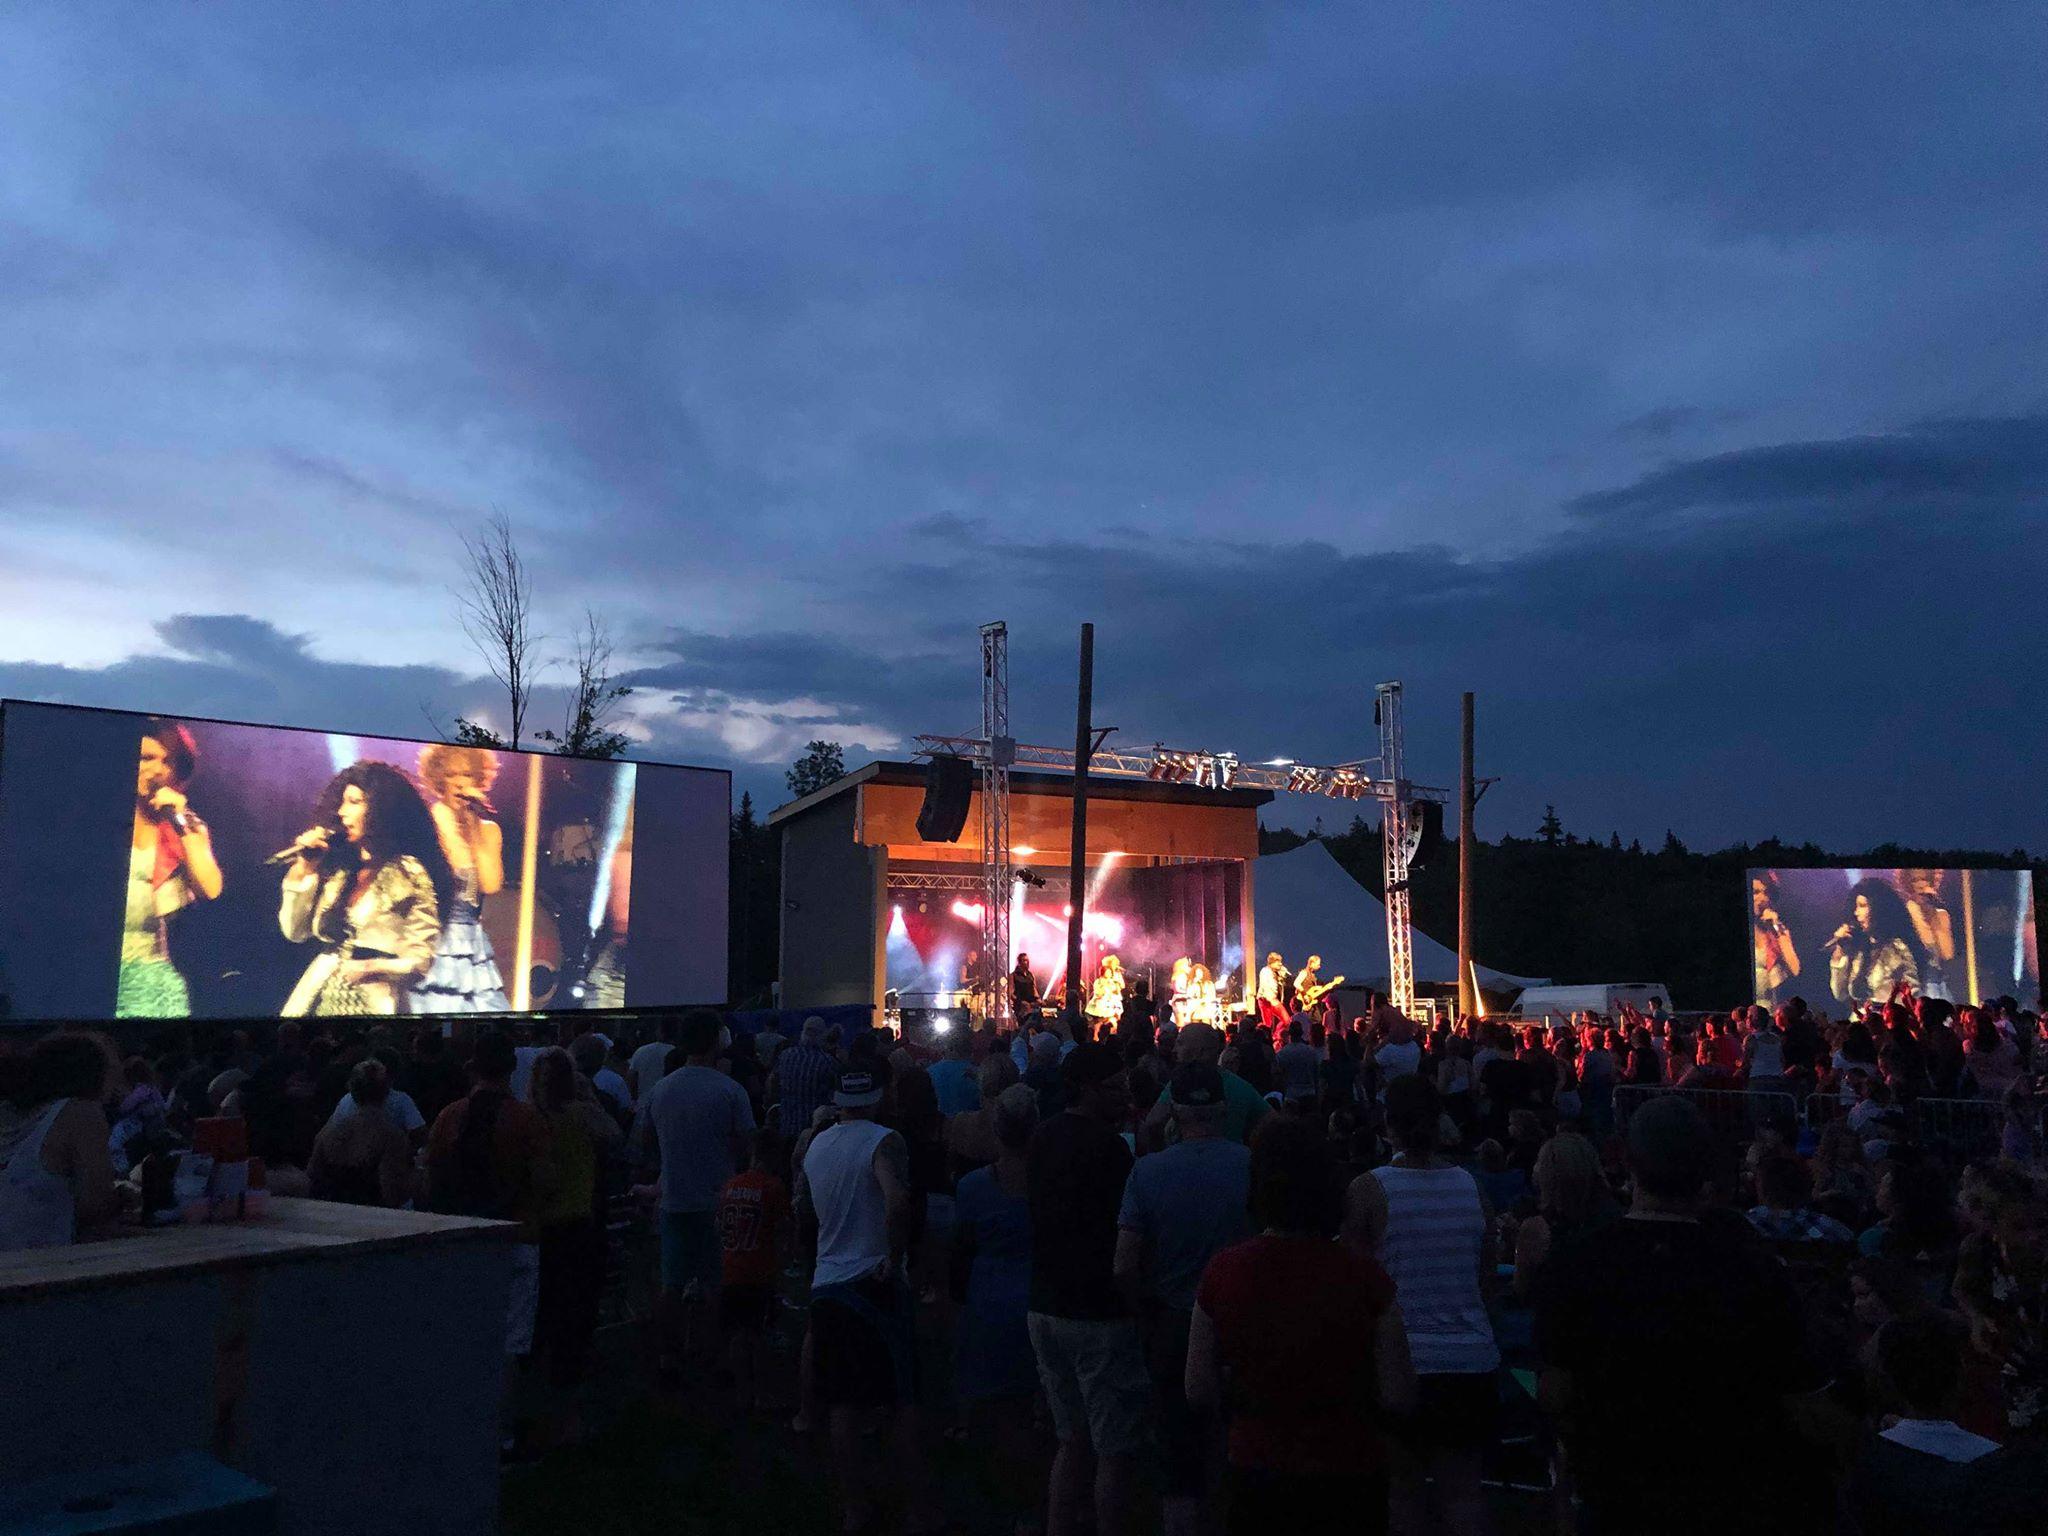 http://www.campingatlantide.com/wp-content/uploads/2019/07/alterego-showband-complexe-atlantide-2019-22.jpg